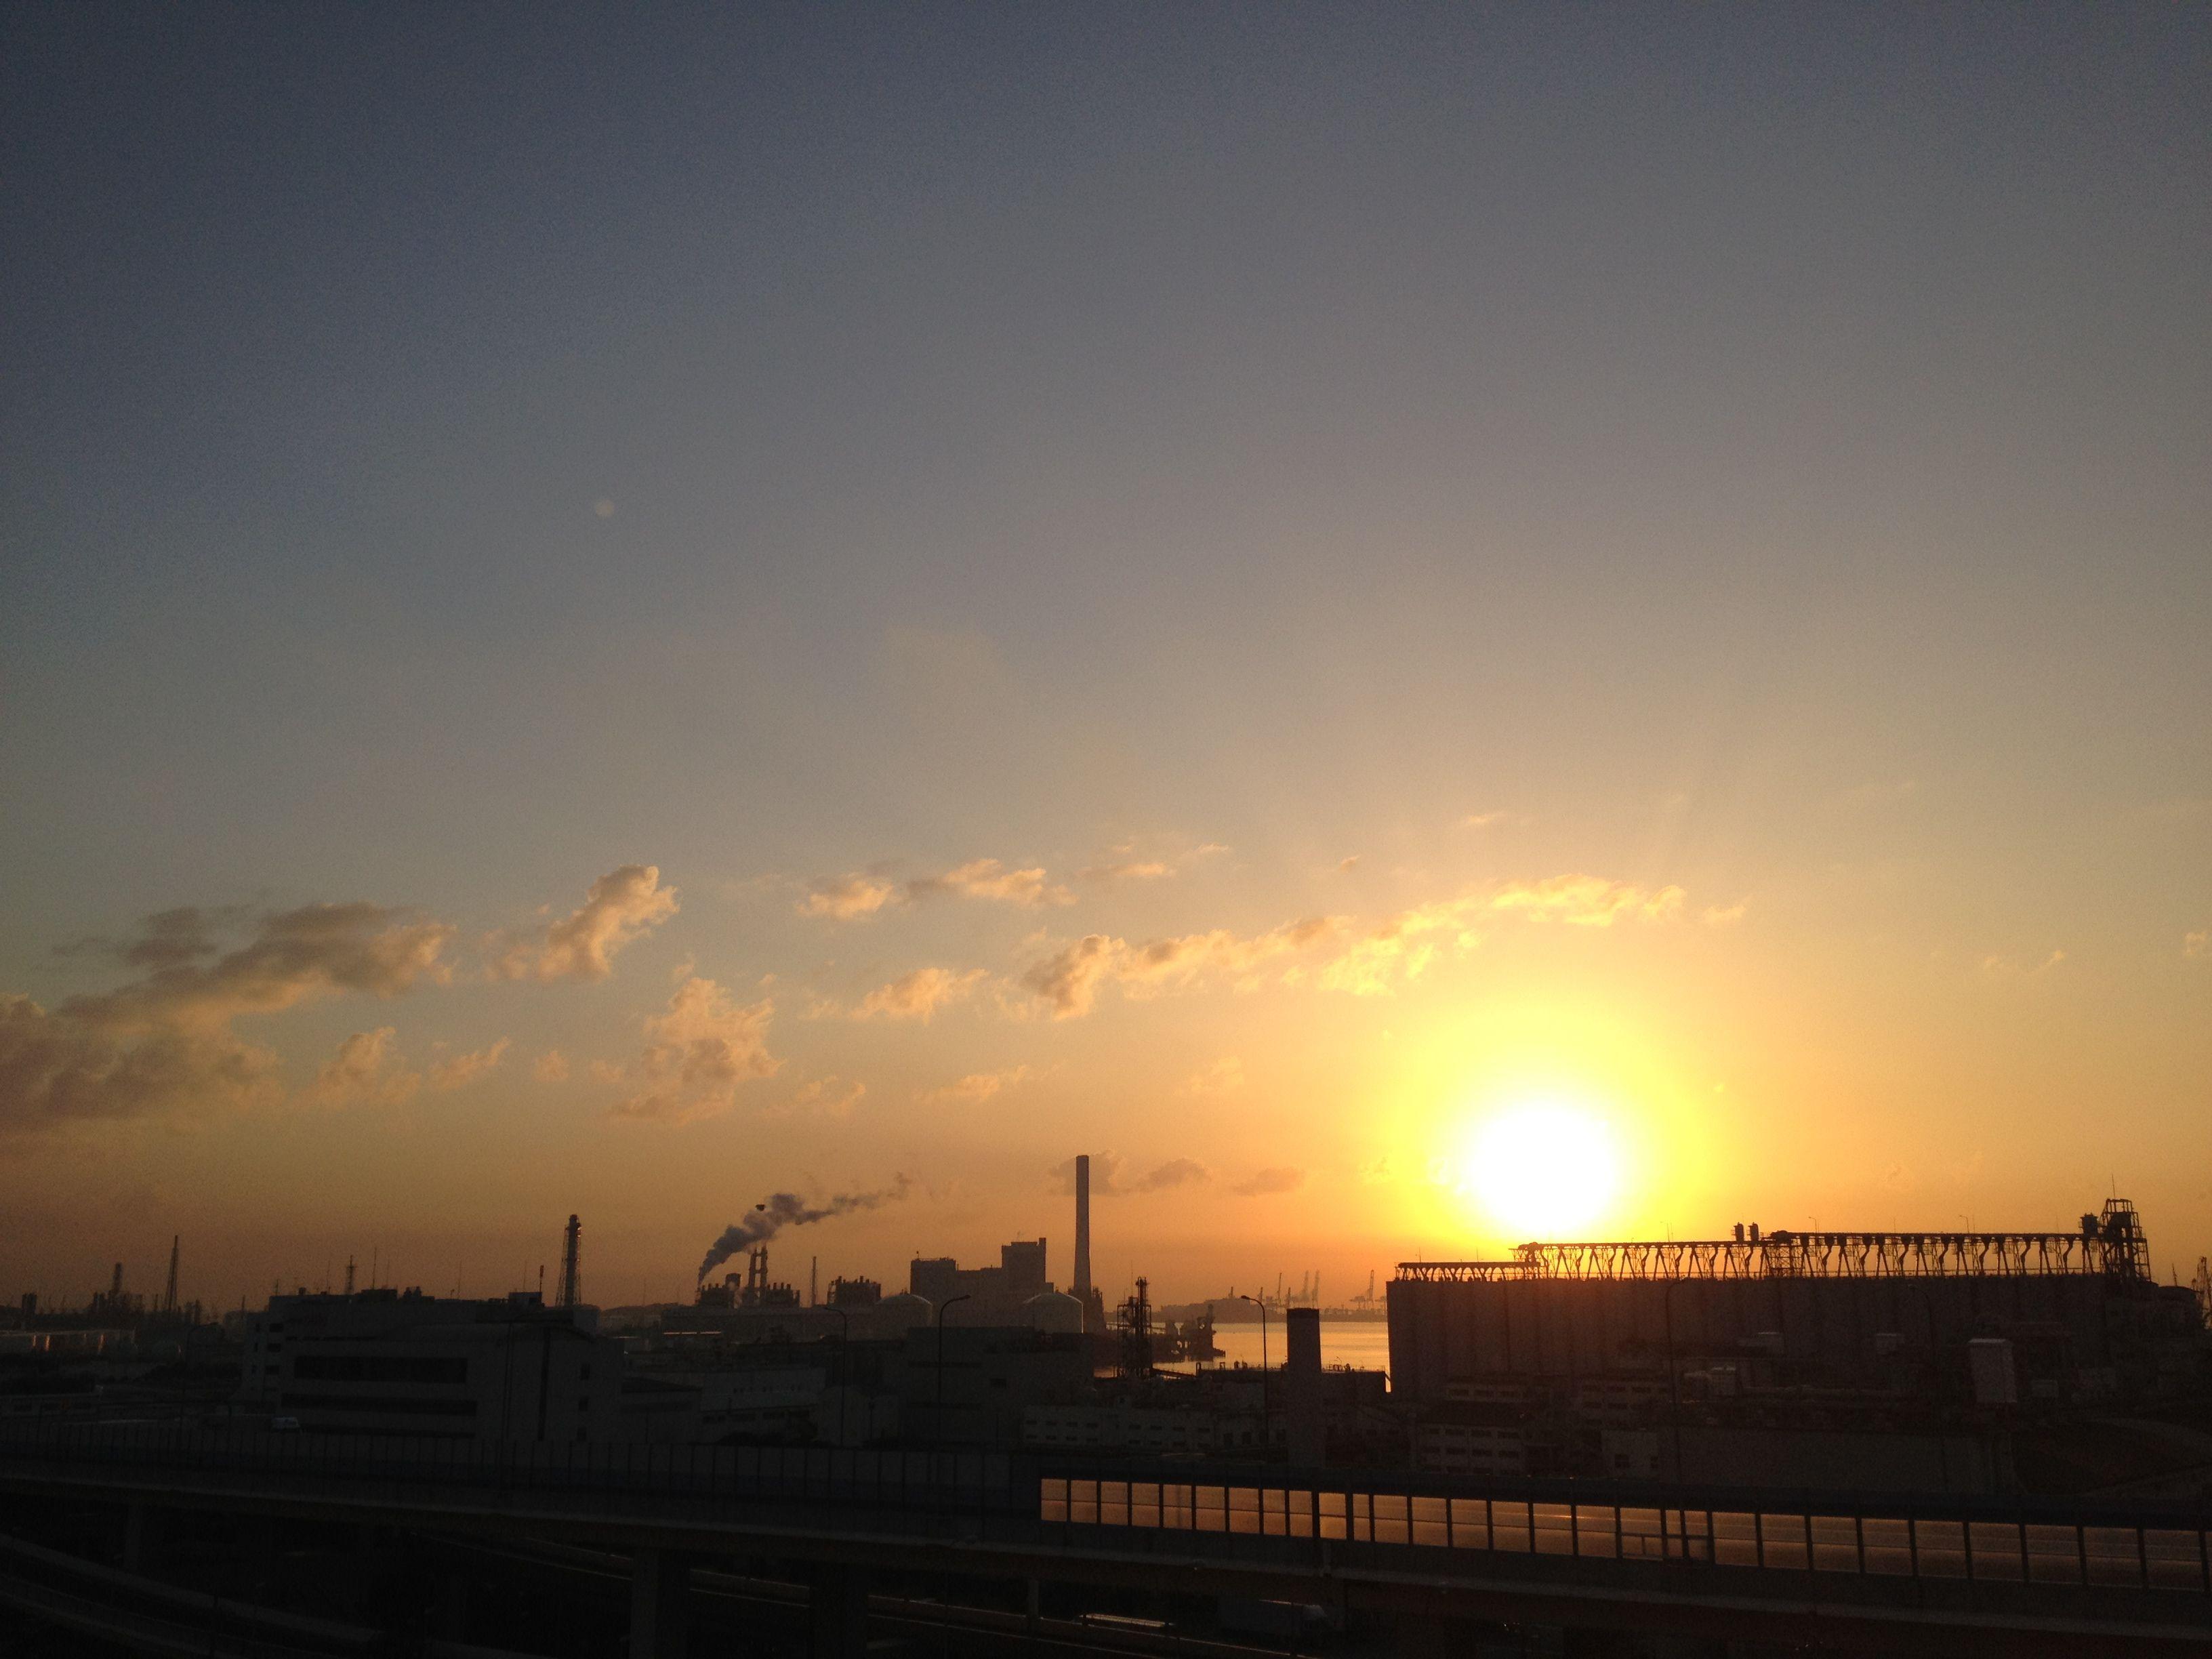 2013,September,Sunrise and cloud